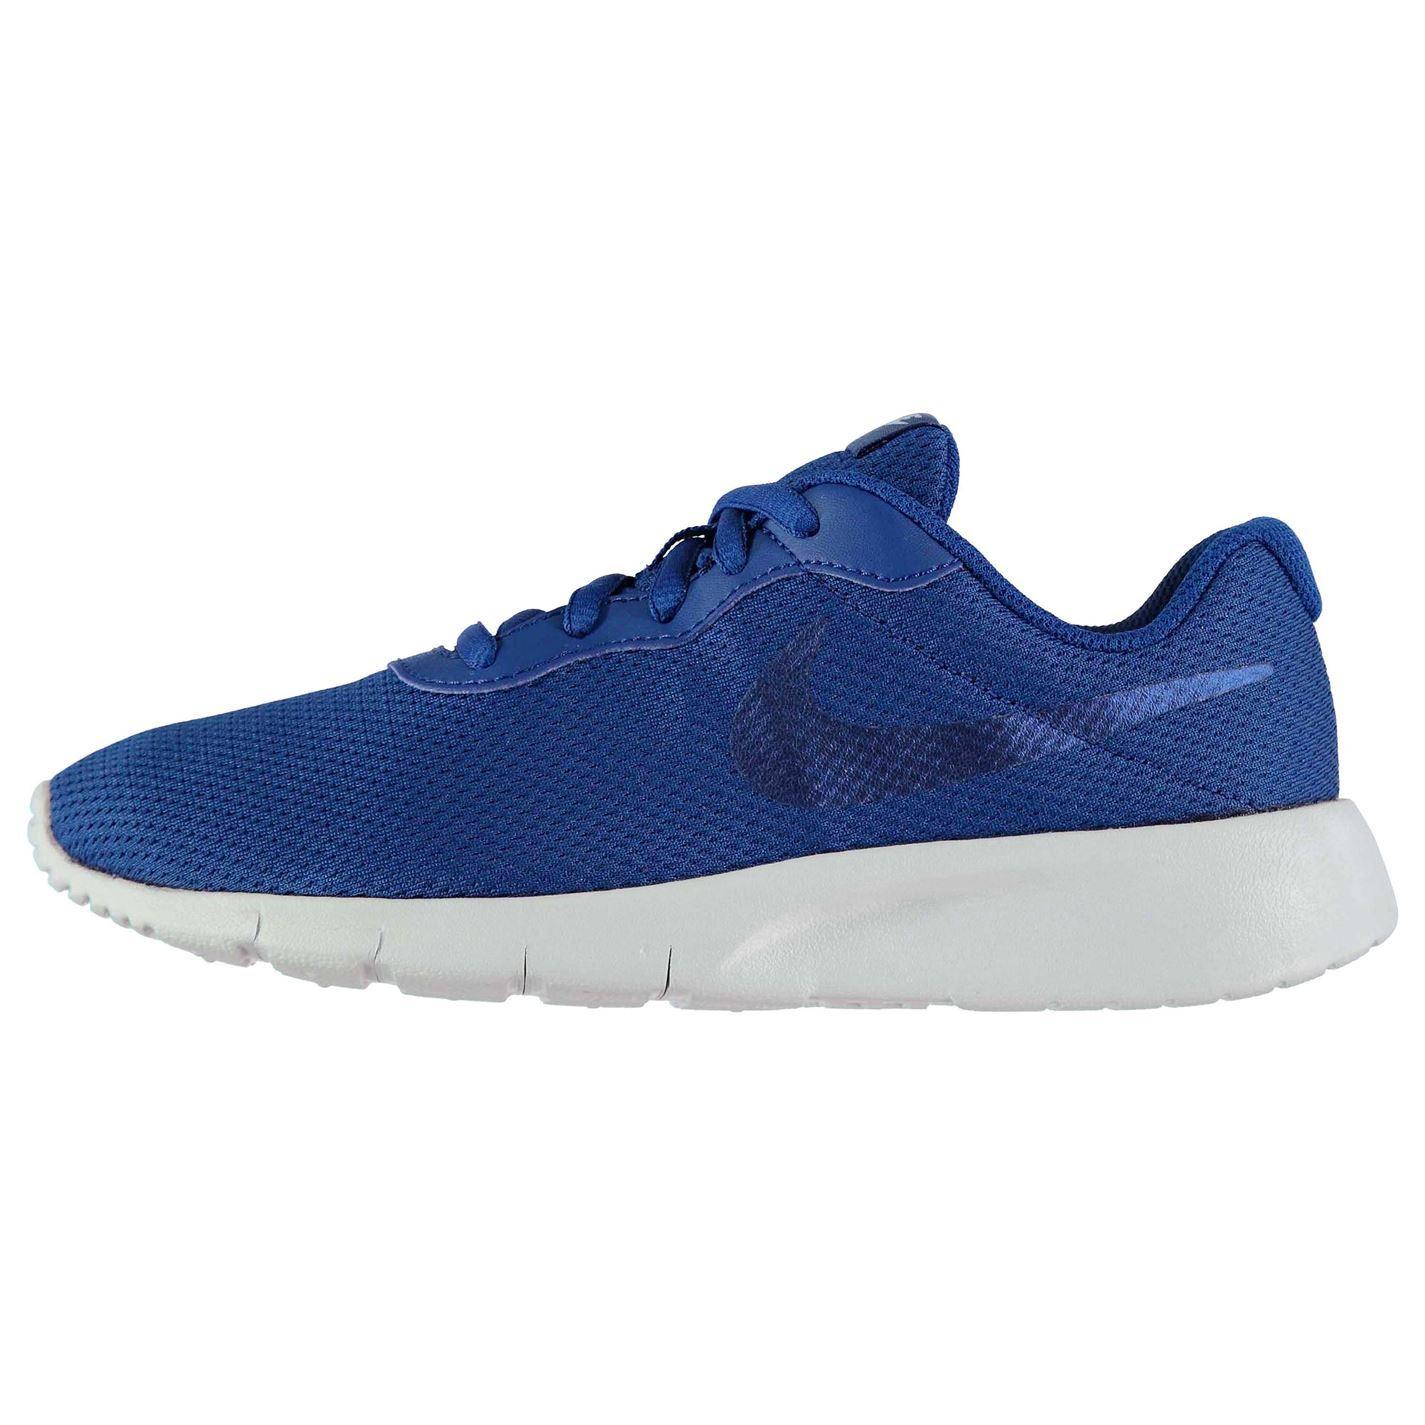 factory authentic 891cf e72dd ... Nike Tanjun Boys Trainers Blue Shoes Footwear ...